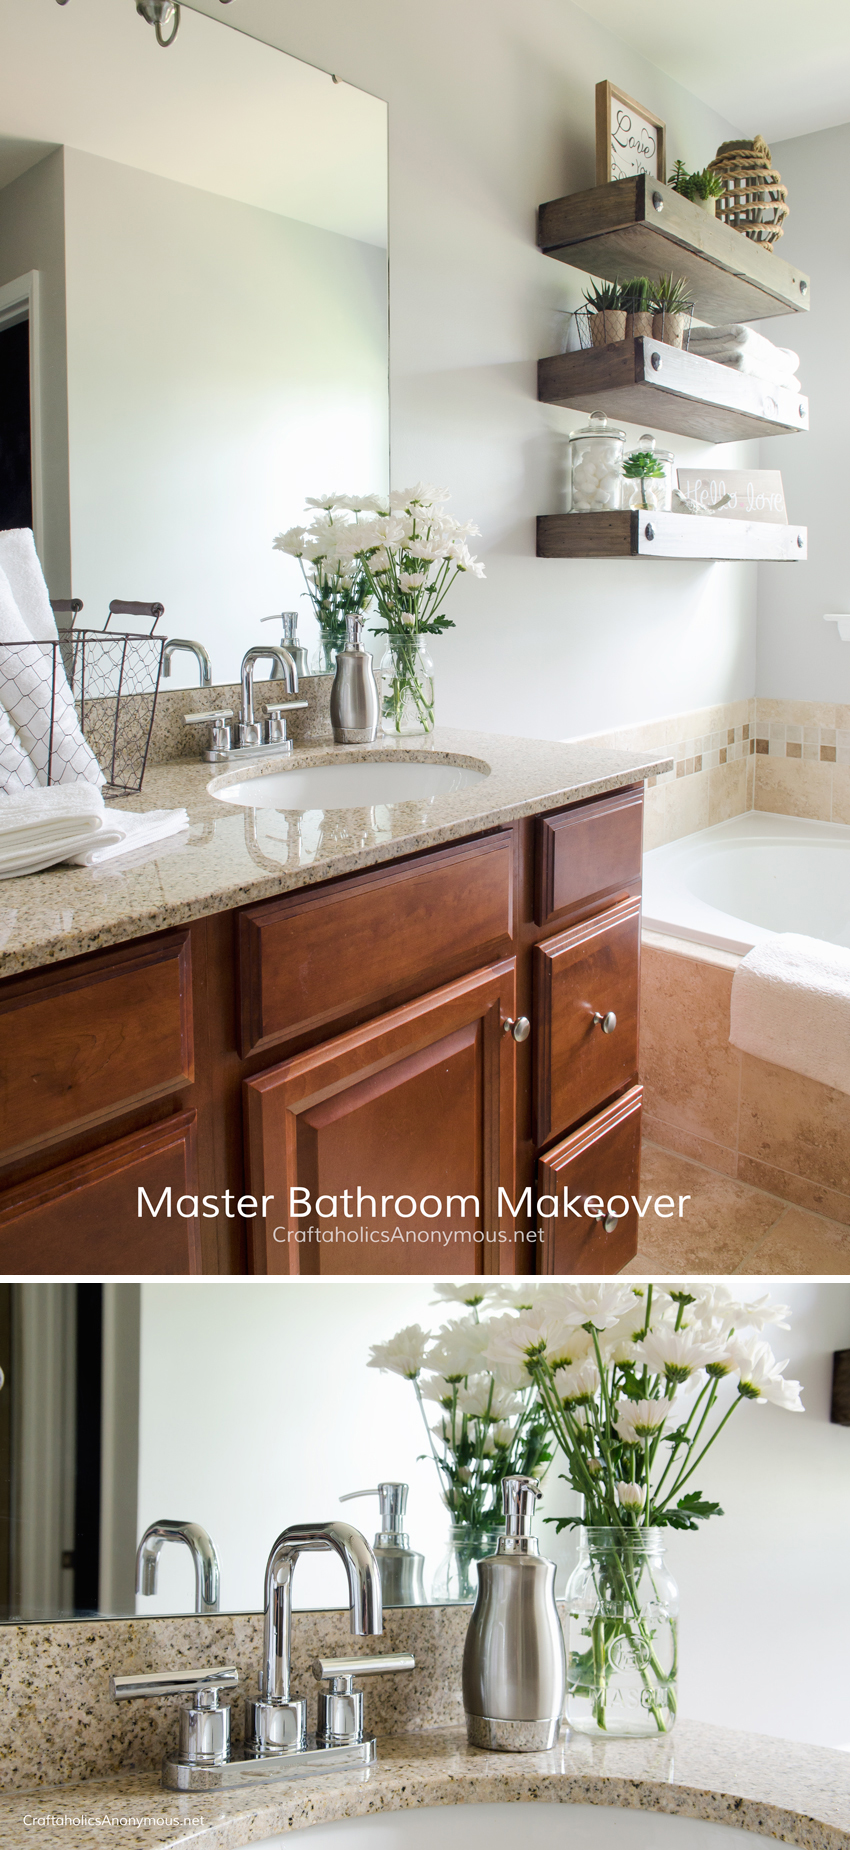 Master Bathroom Makeover DIY